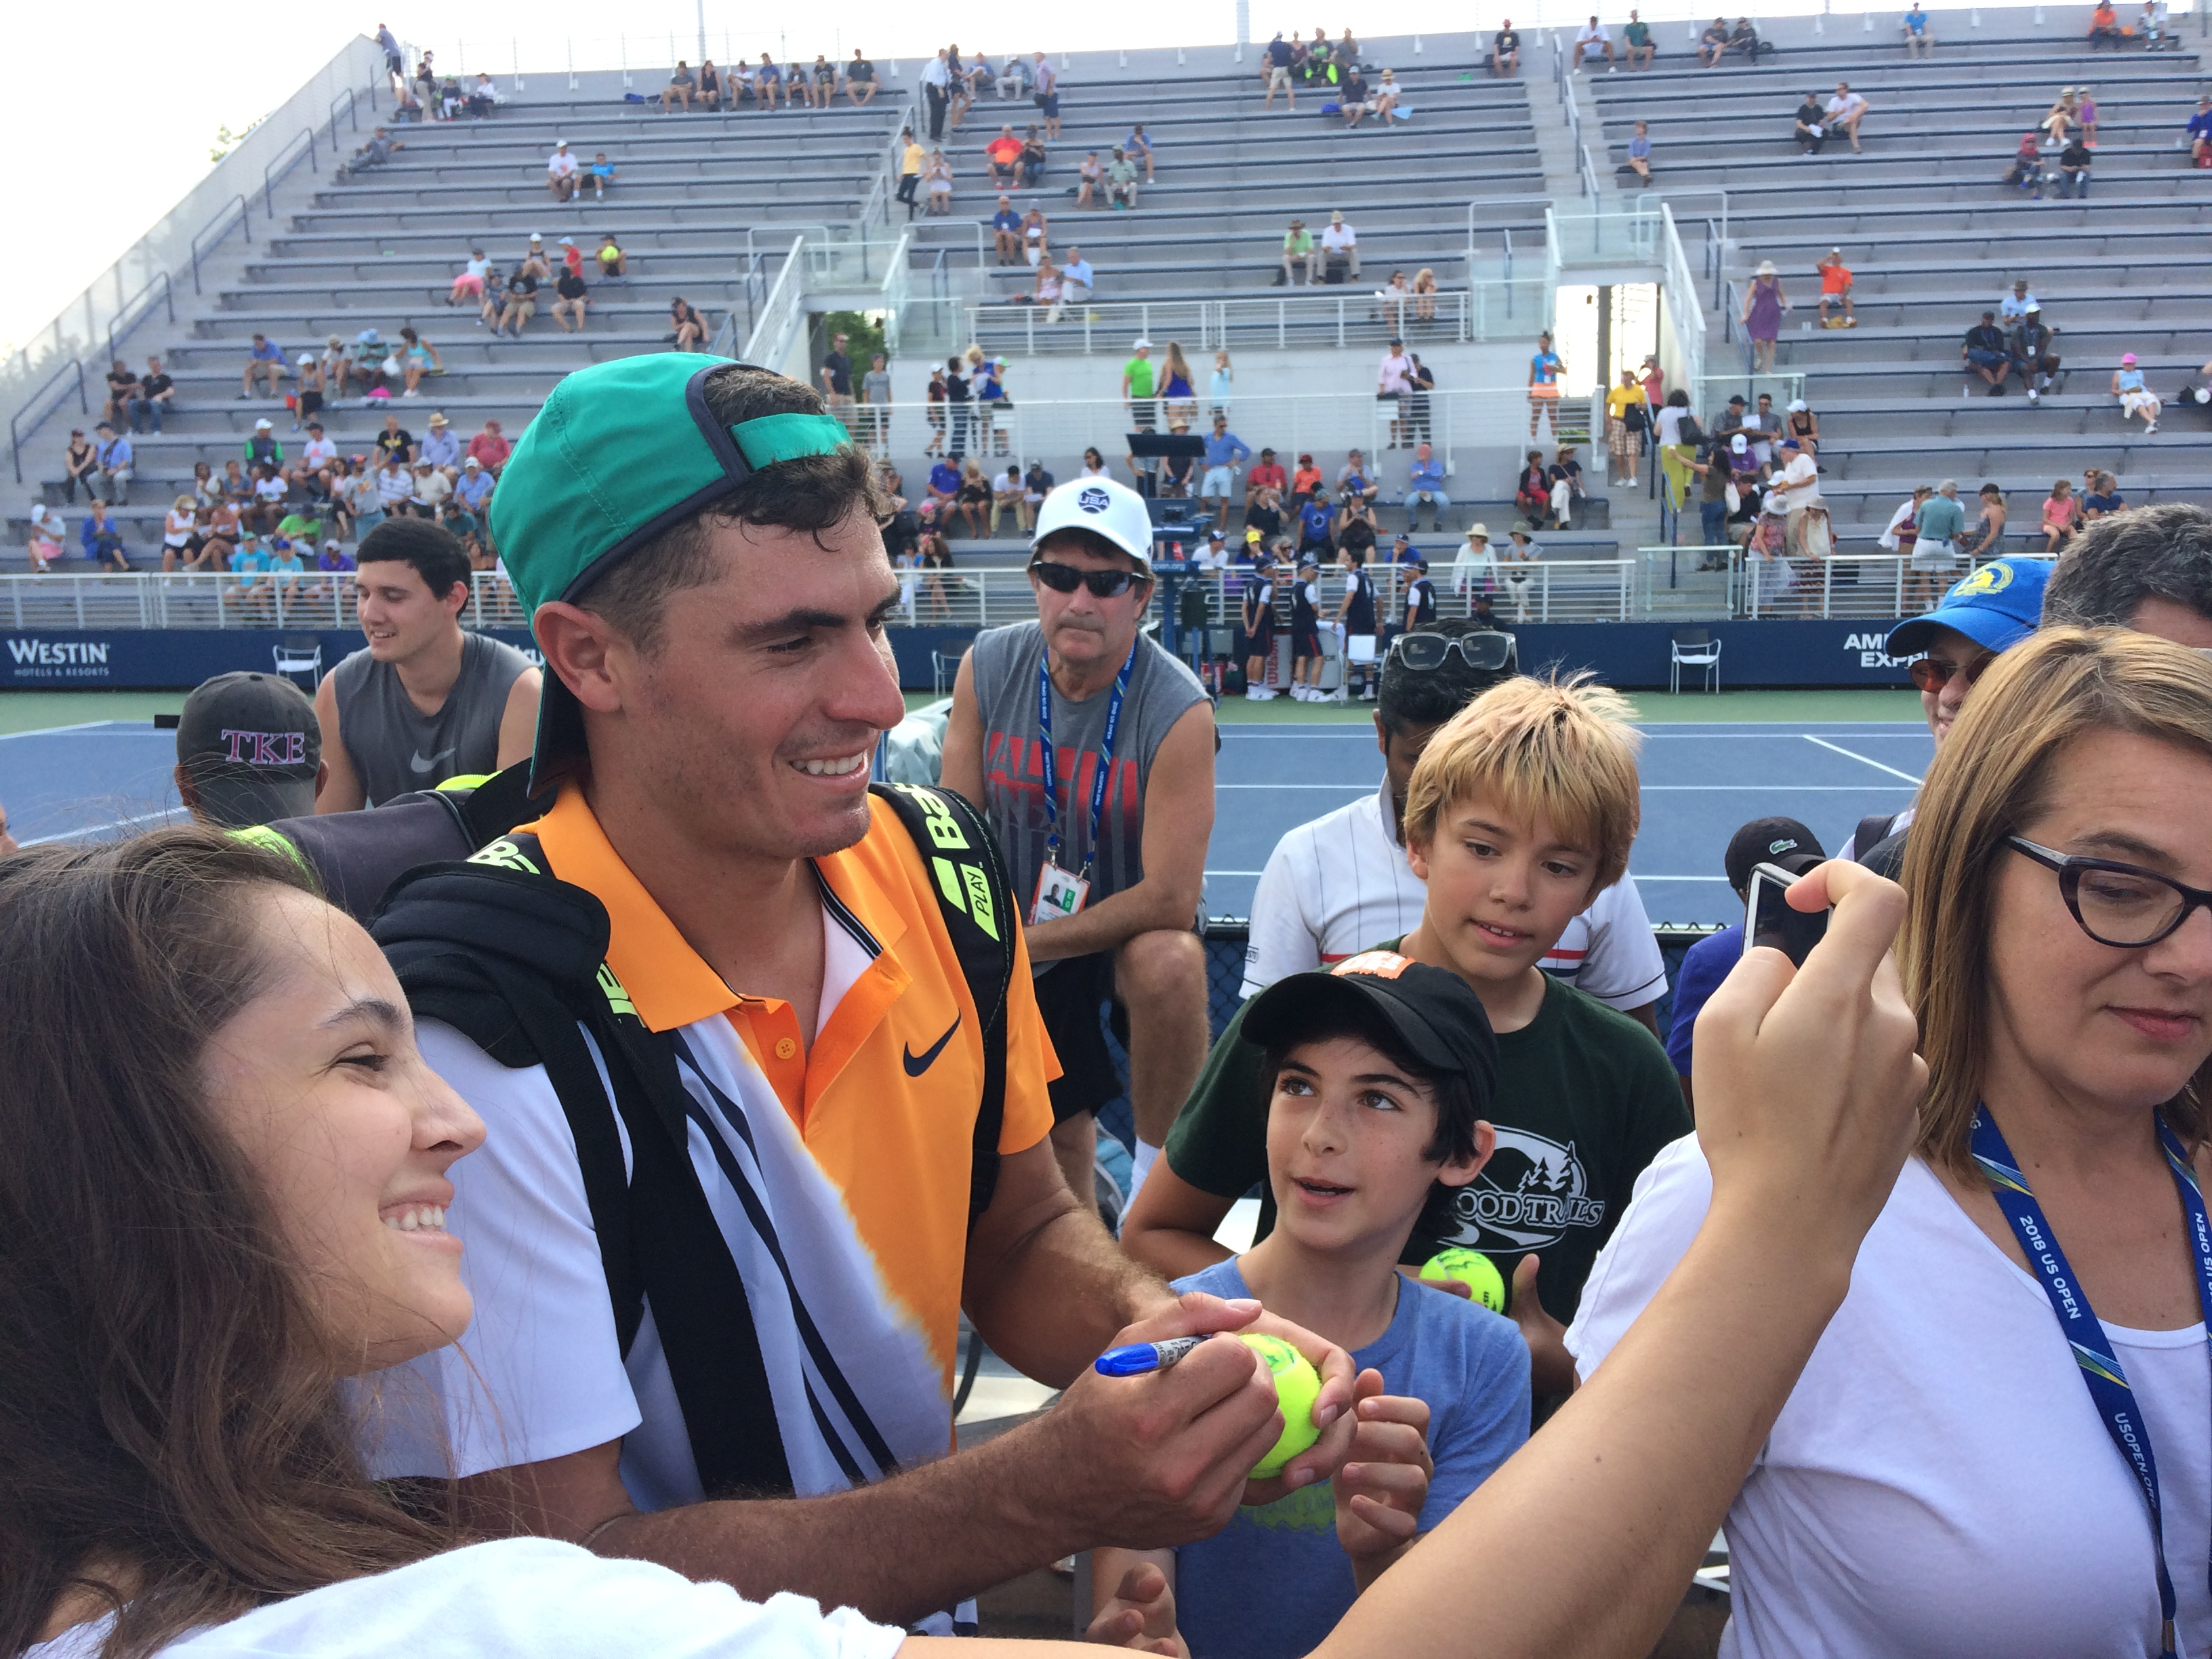 Ernesto Escobedo, 2018 US Open (Photo: Tennis Atlantic.com)